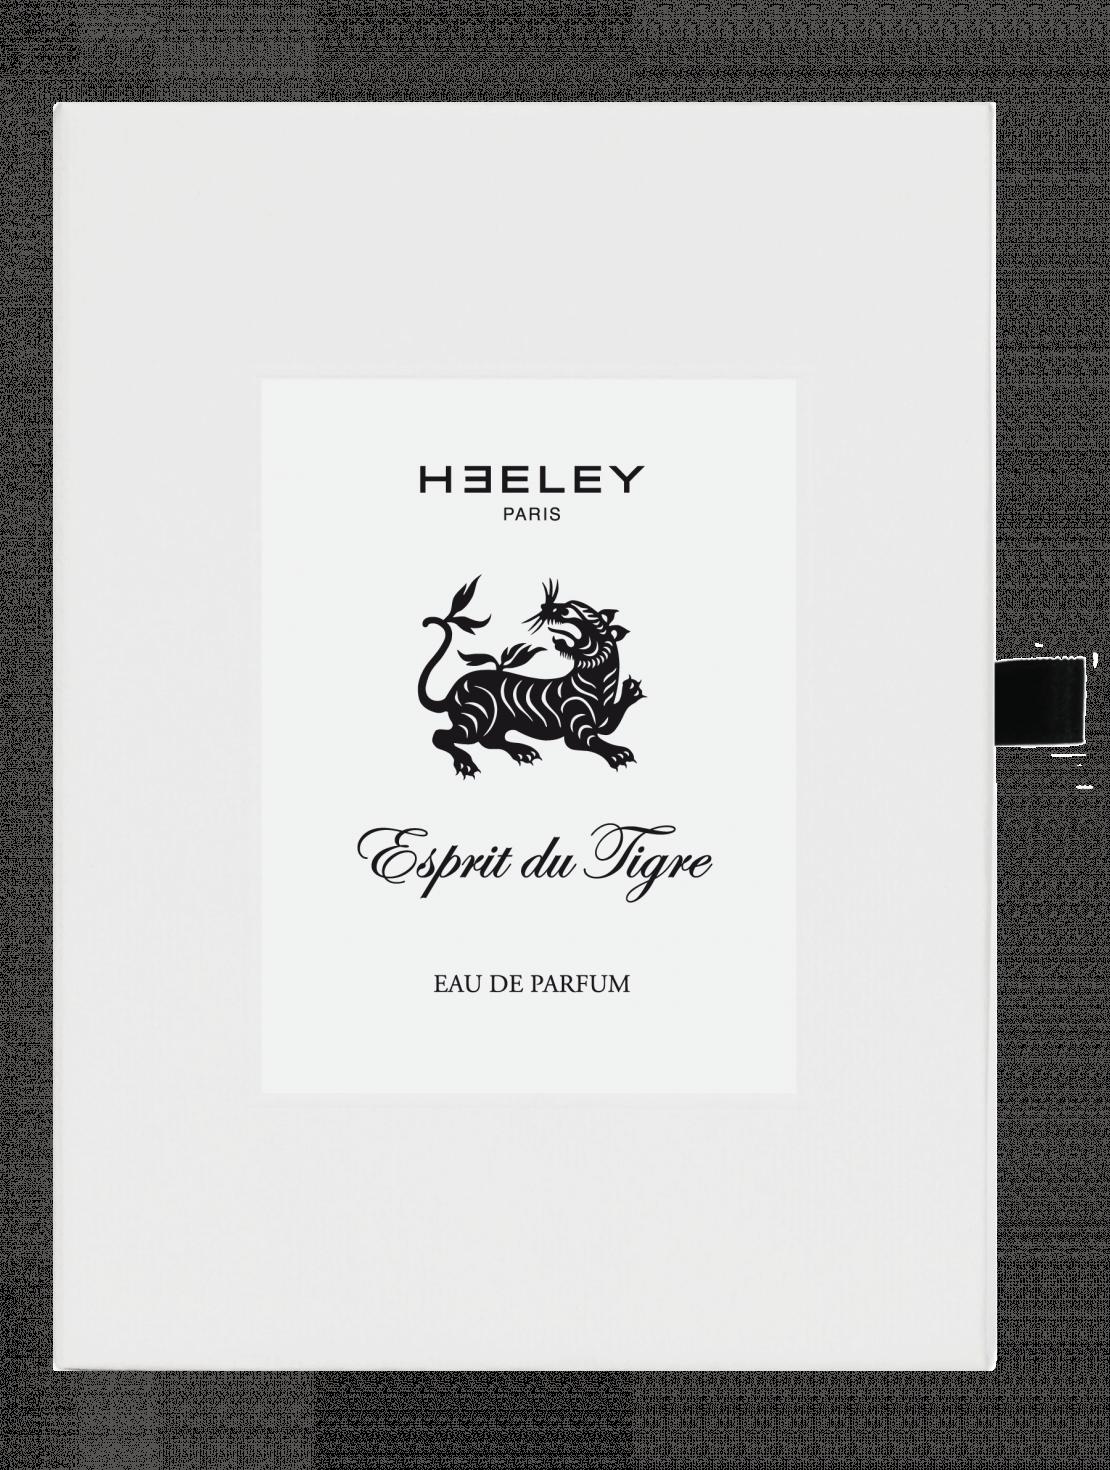 HEELEY-Esprit du Tigre EdP